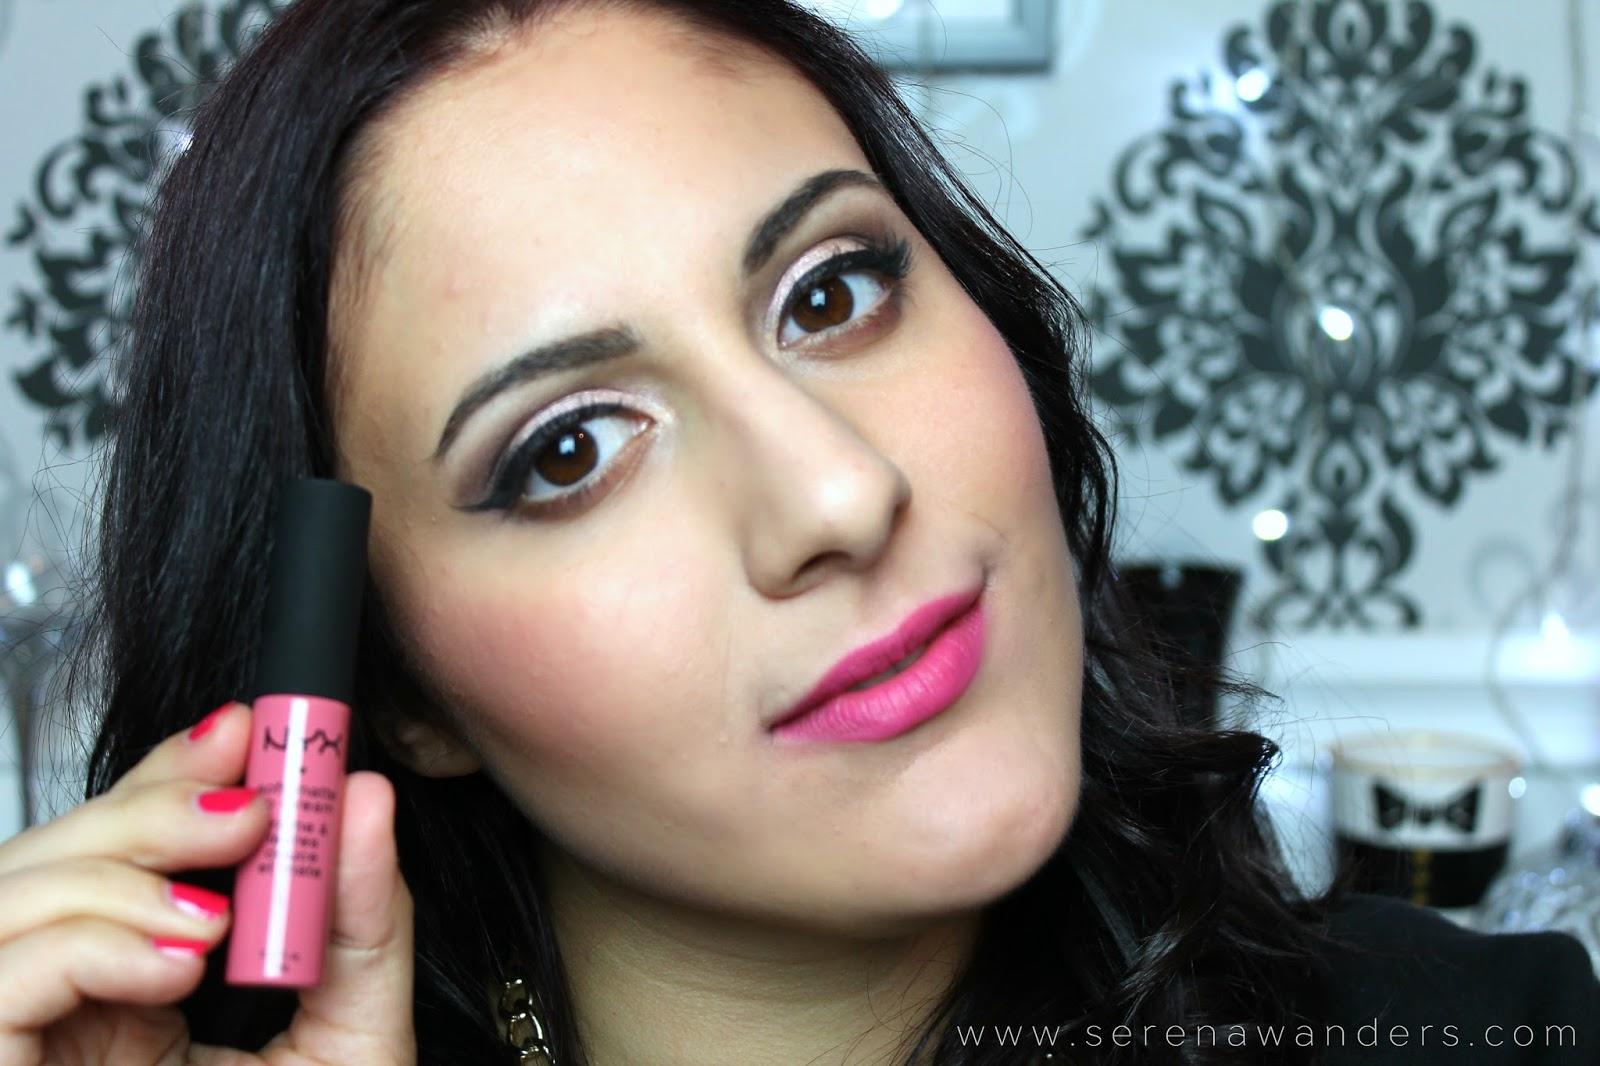 Serena Wanders Liquid Lipstick Collection